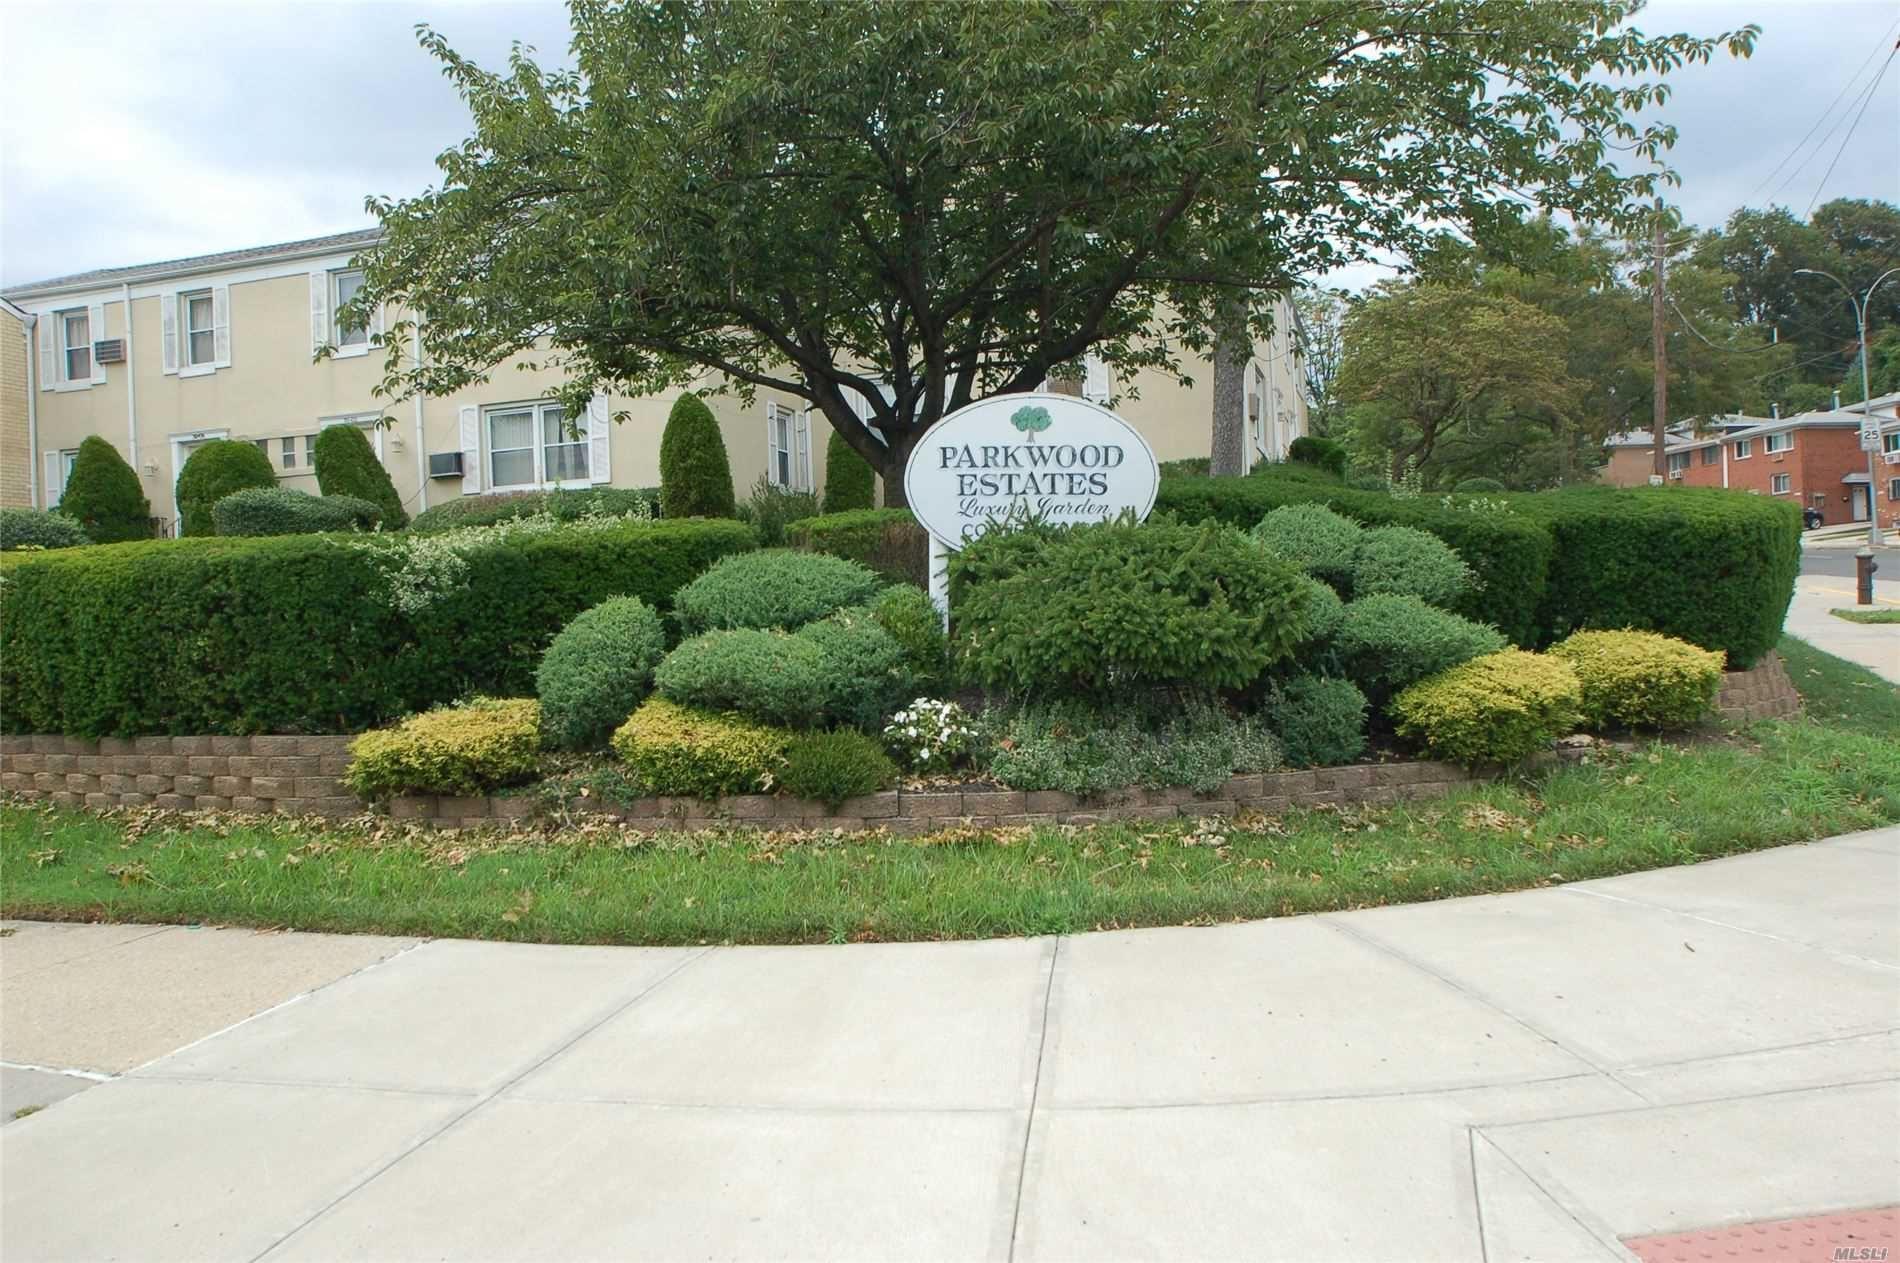 251-17 71 Avenue #106A, Bellerose, NY 11426 - MLS#: 3241501